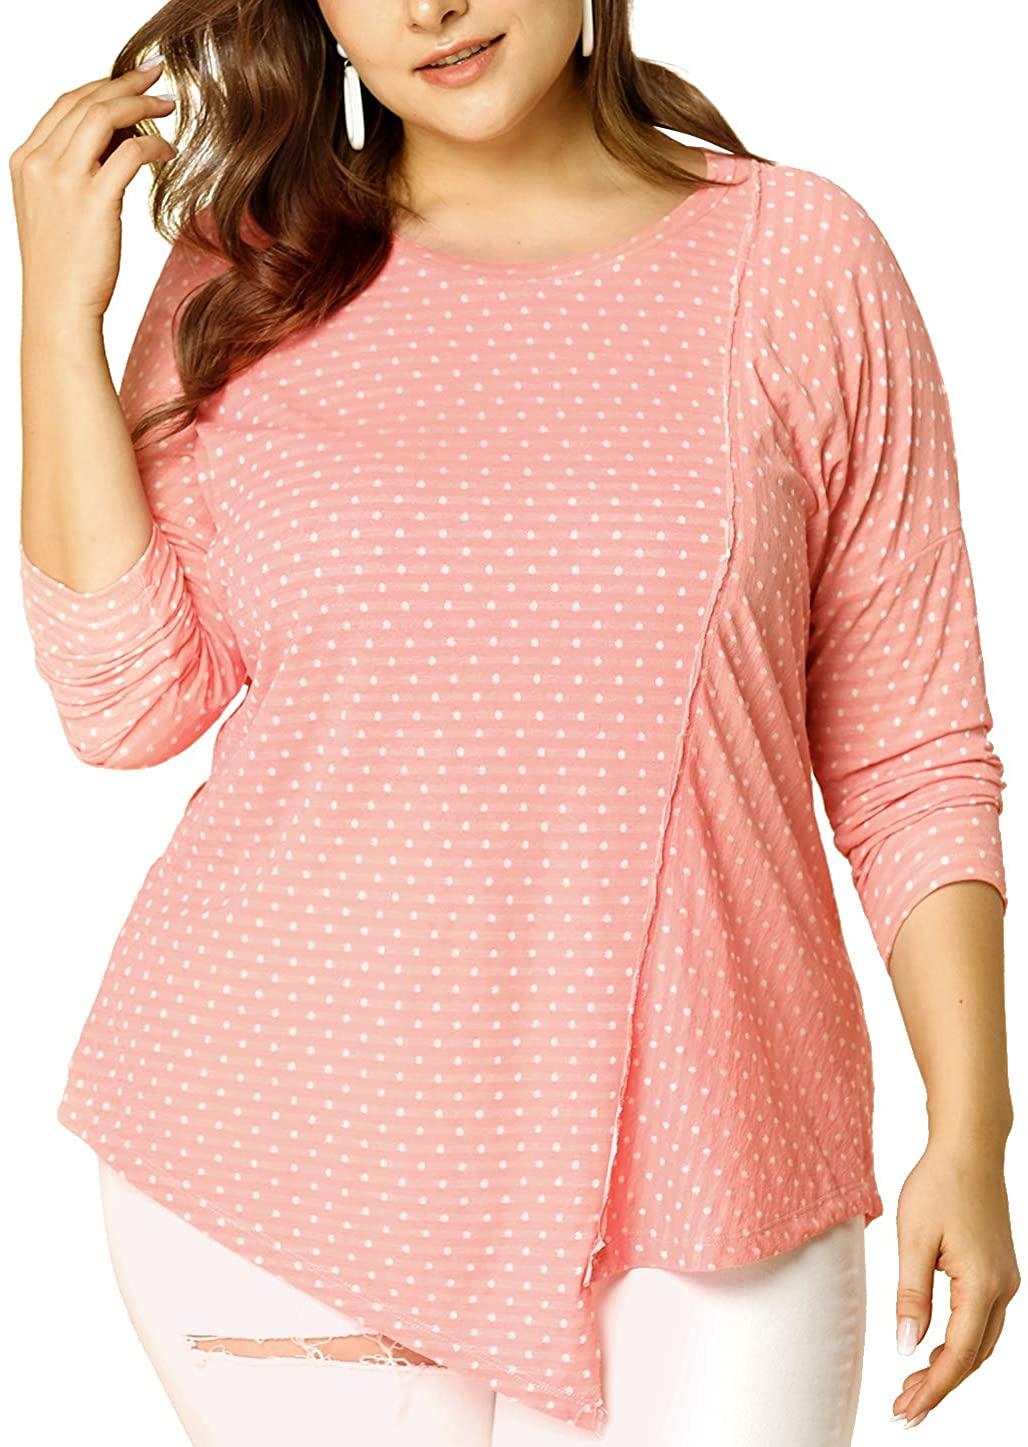 Agnes Orinda Women's Plus Size Knit Top Polka Dots Long Sleeves Irregular Tops 2X Pink